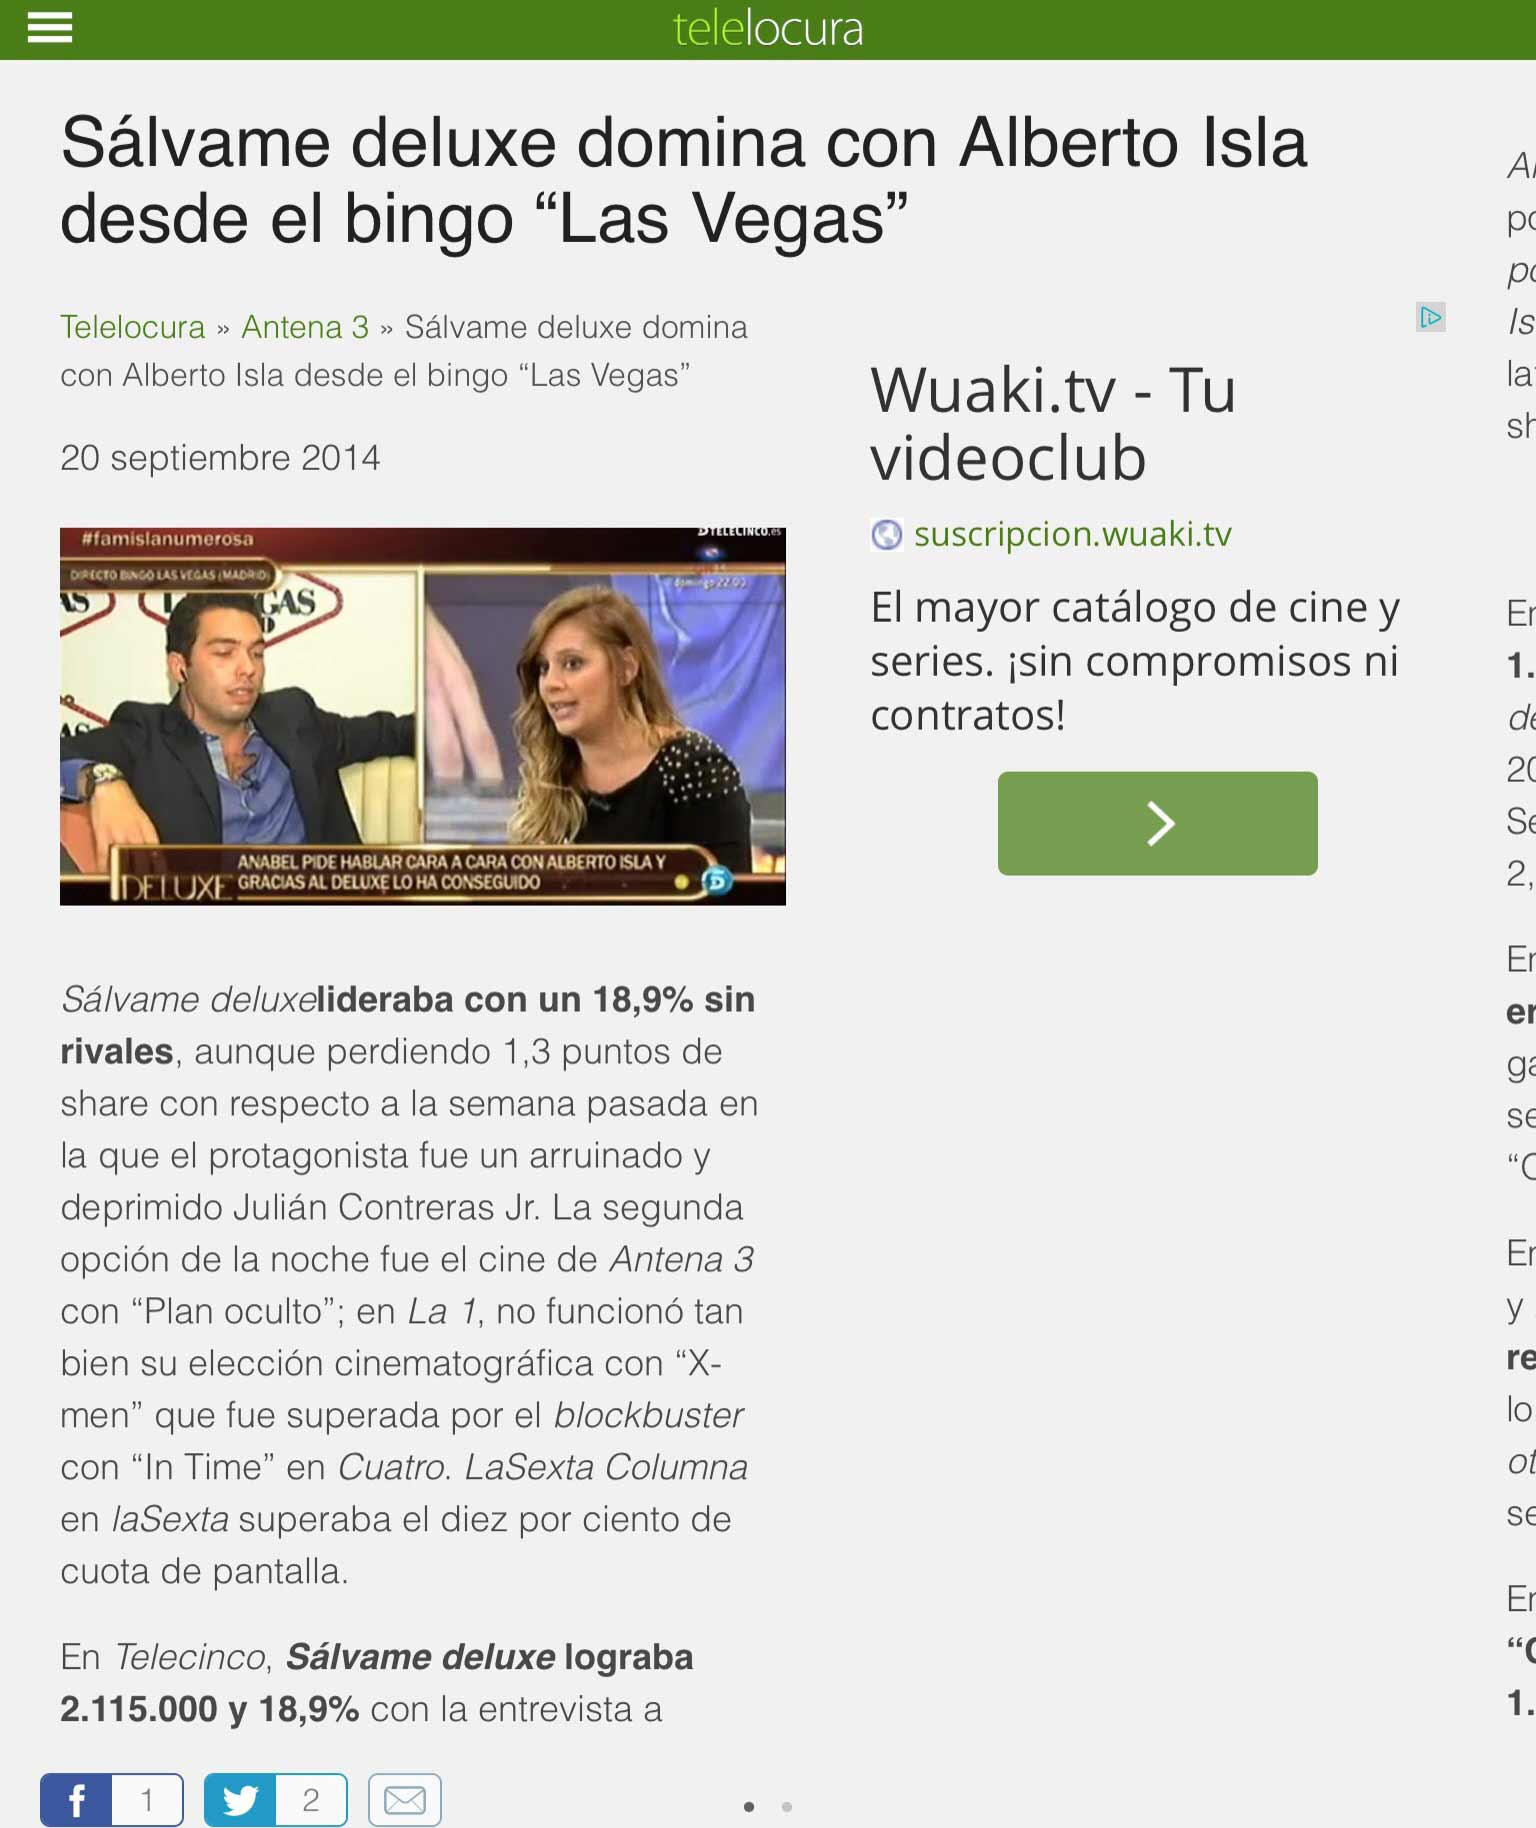 Sálvame Deluxe domina con Alberto Isla desde Bingo Las Vegas